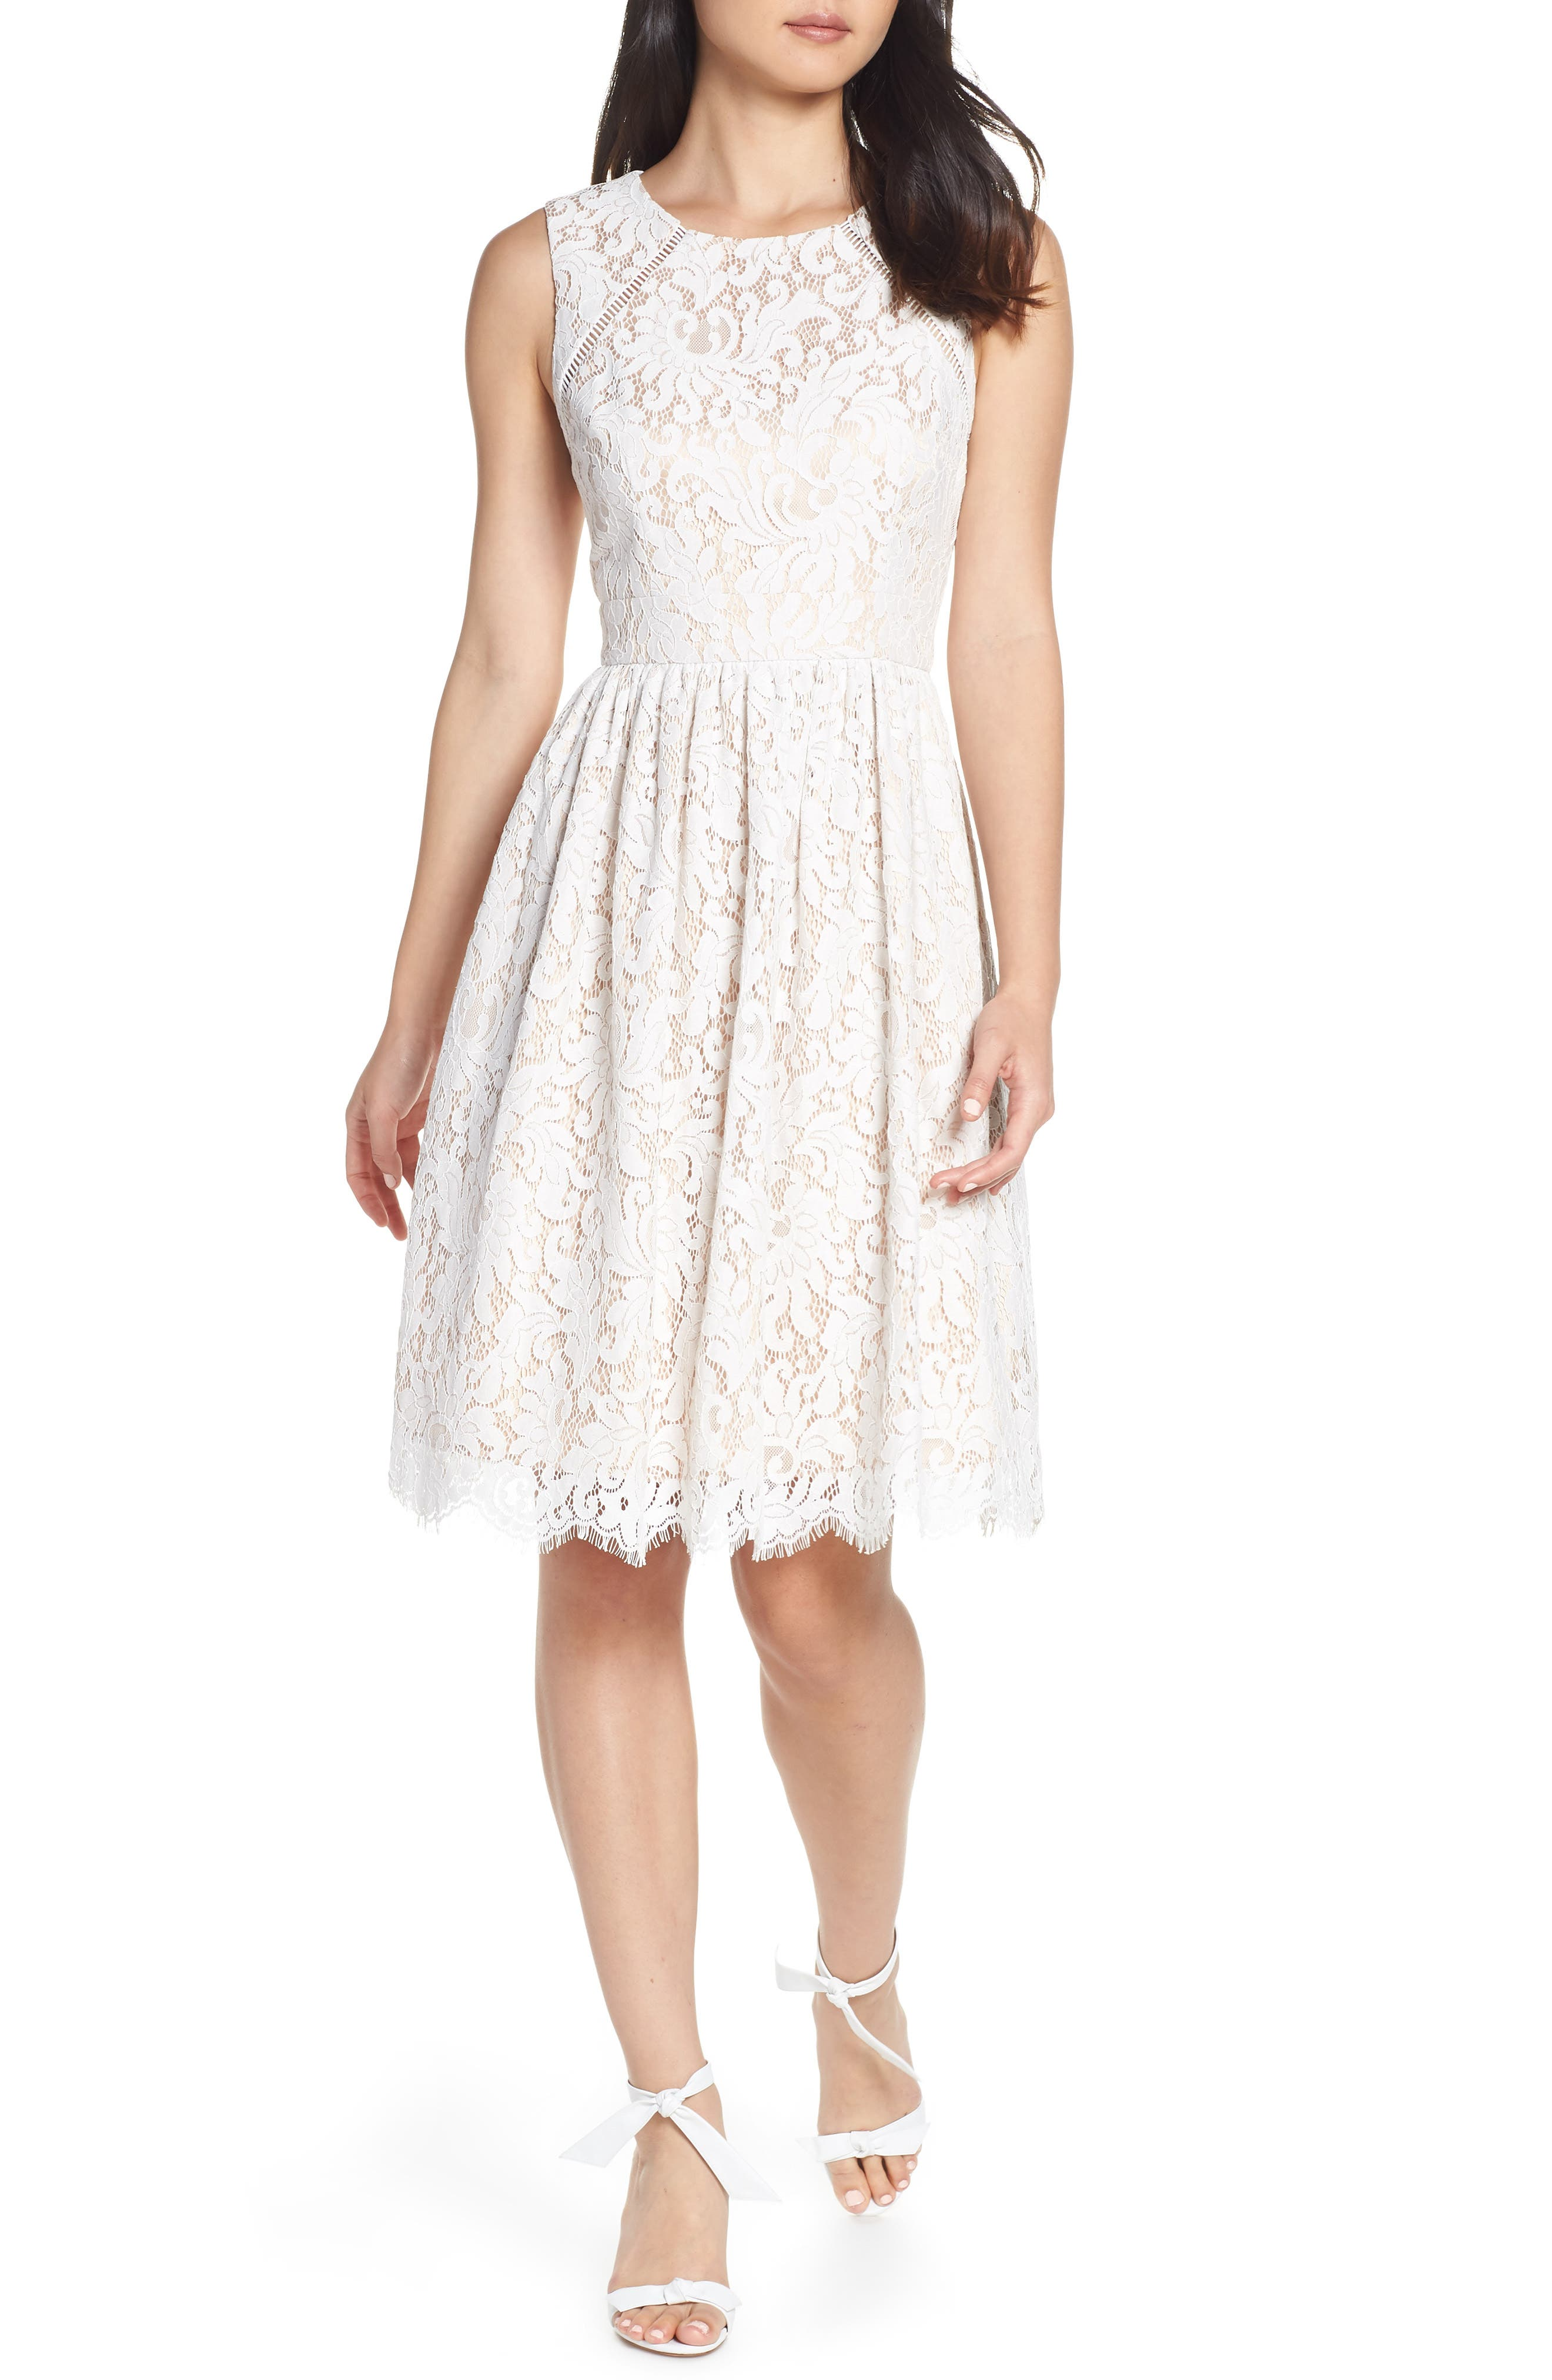 ELIZA J, Lace Fit & Flare Dress, Main thumbnail 1, color, IVORY